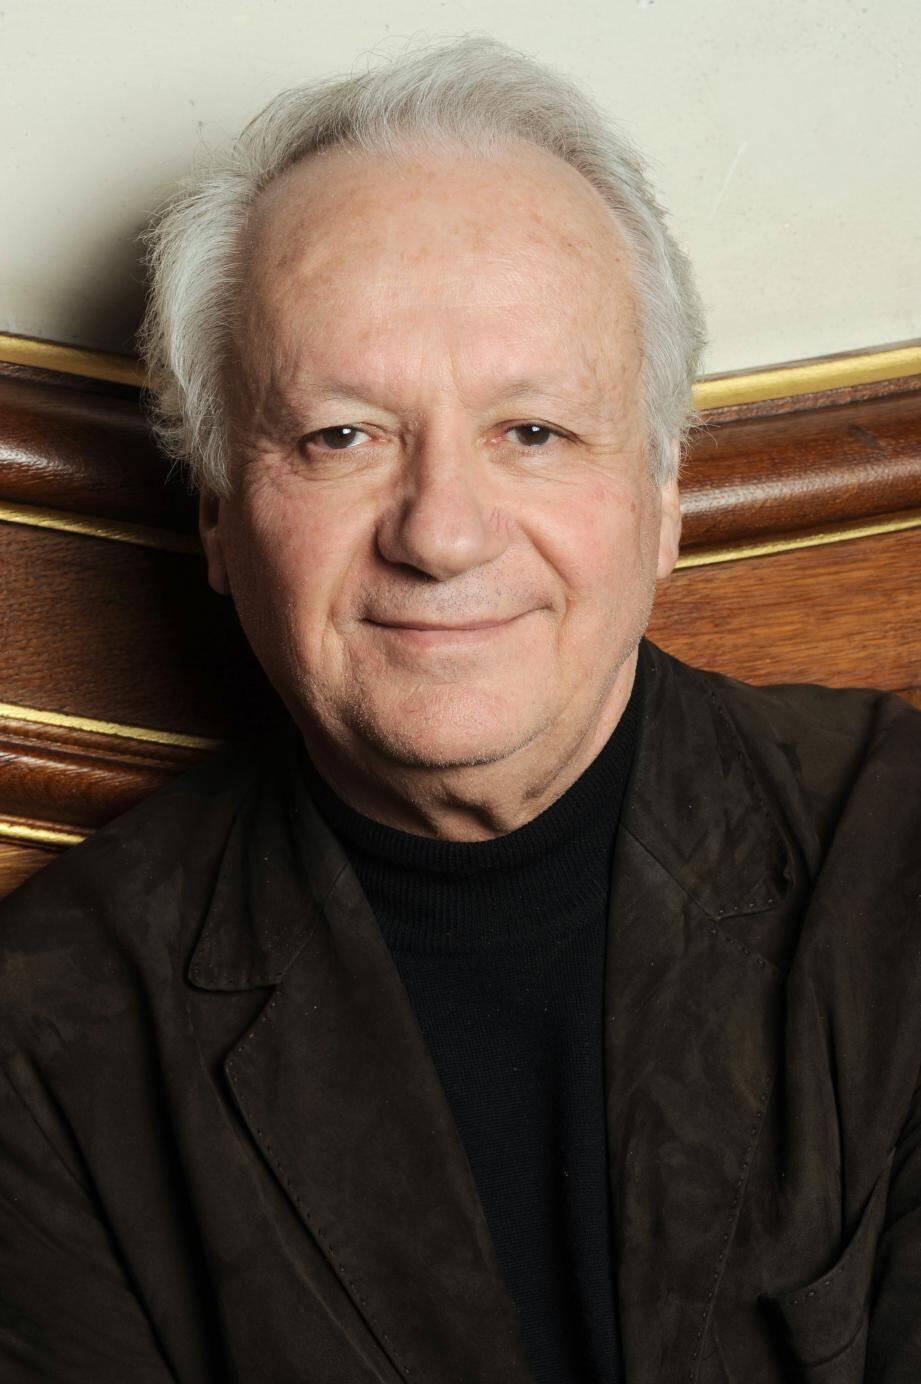 Jean-Marie Cavada sera présent le 4 février au siège de Nice-Matin à Nice.